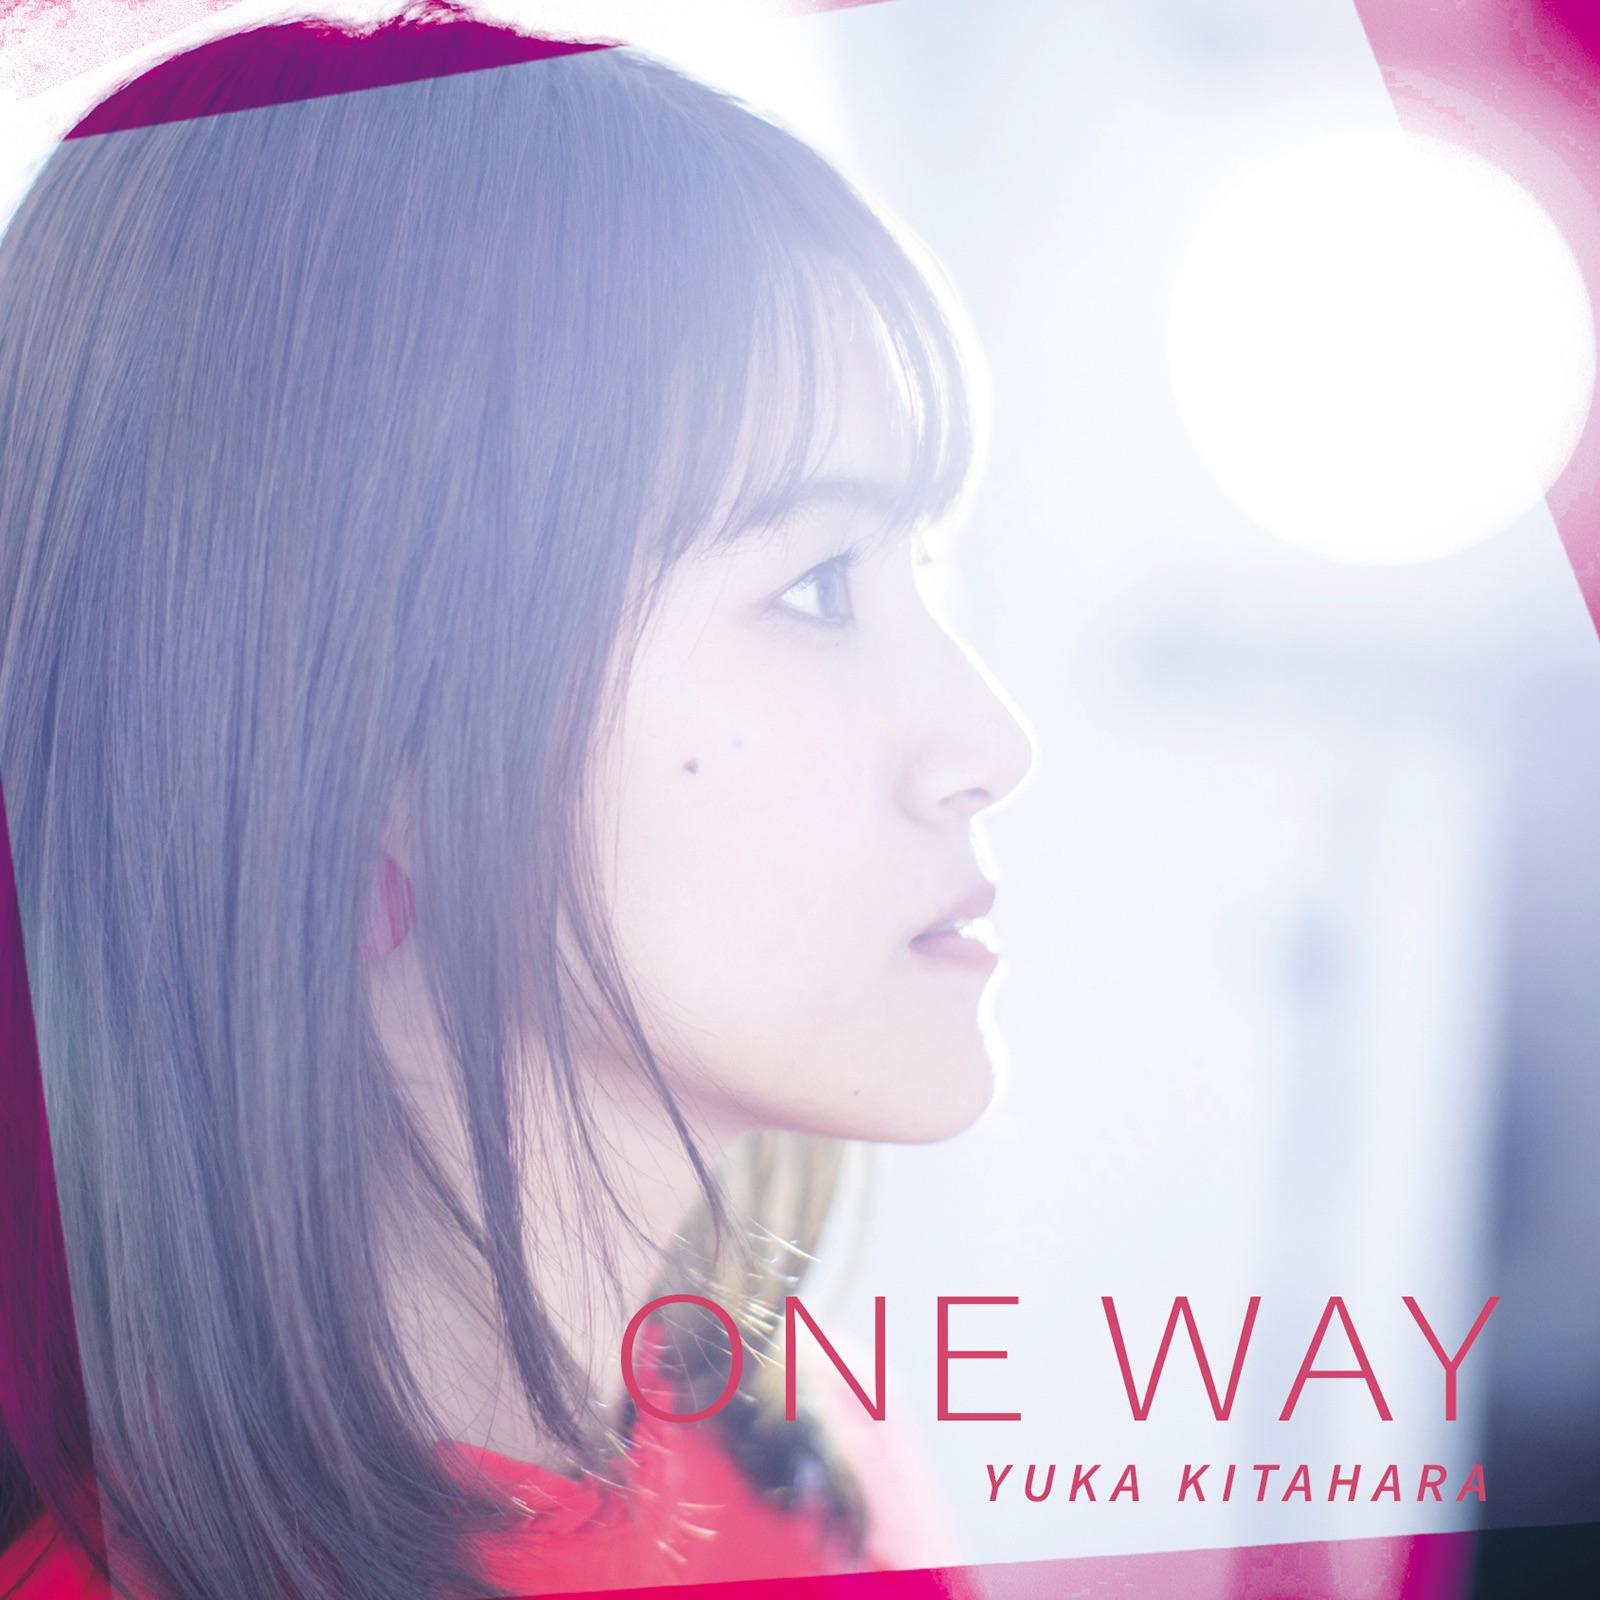 ONE WAY - EP